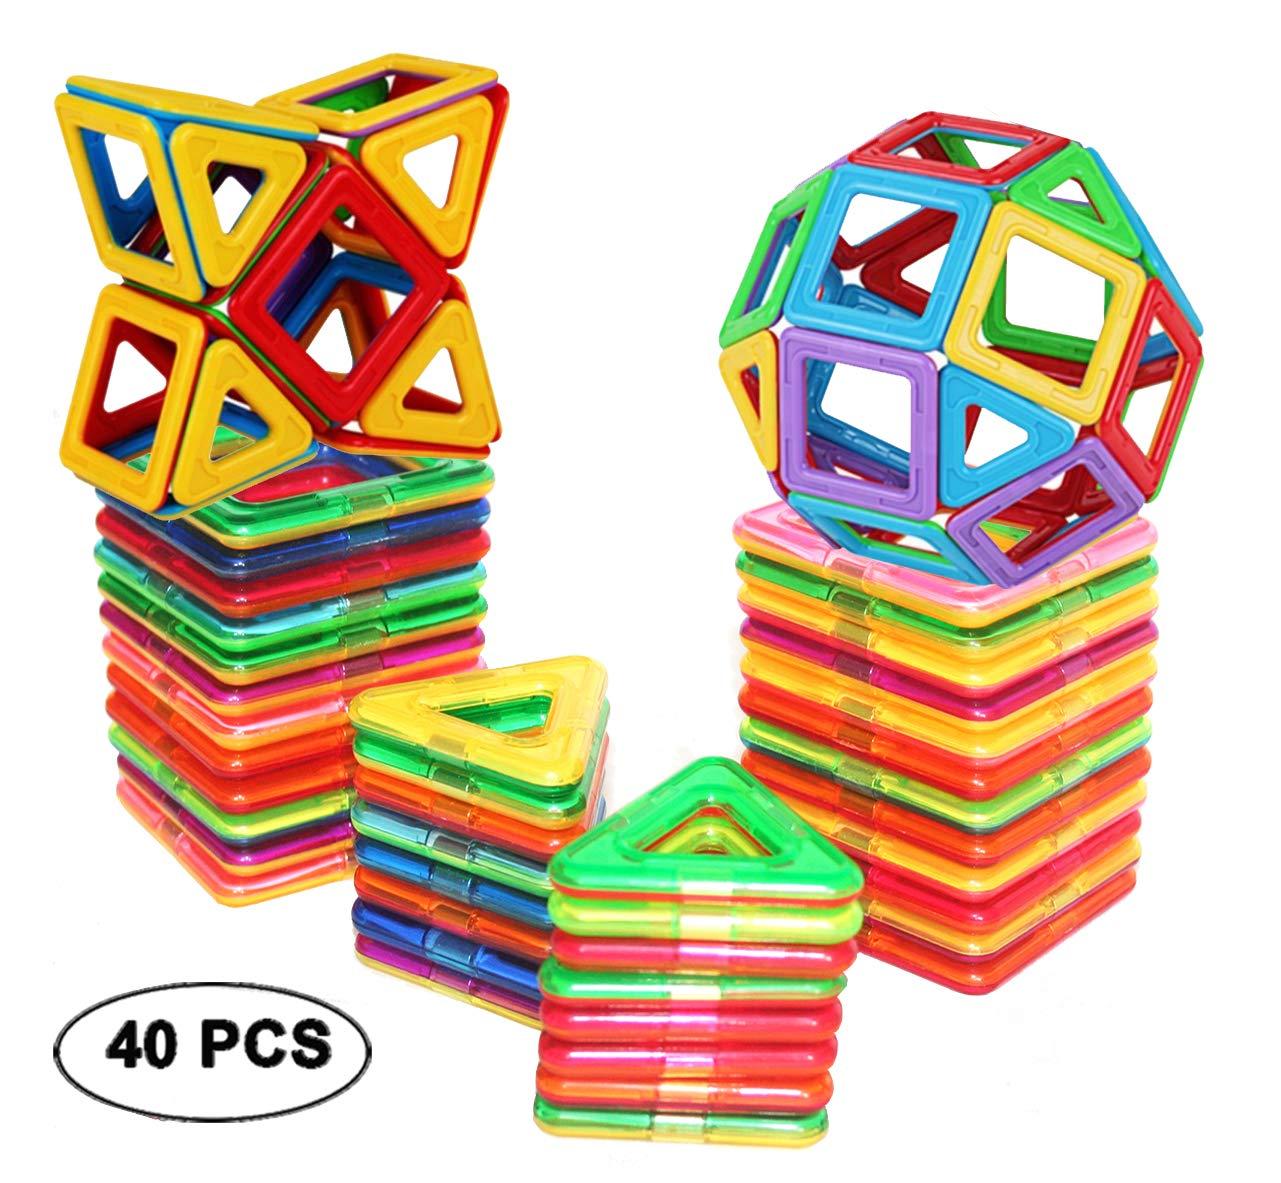 DreambuilderToy Magnetic Tiles Building Blocks Toys